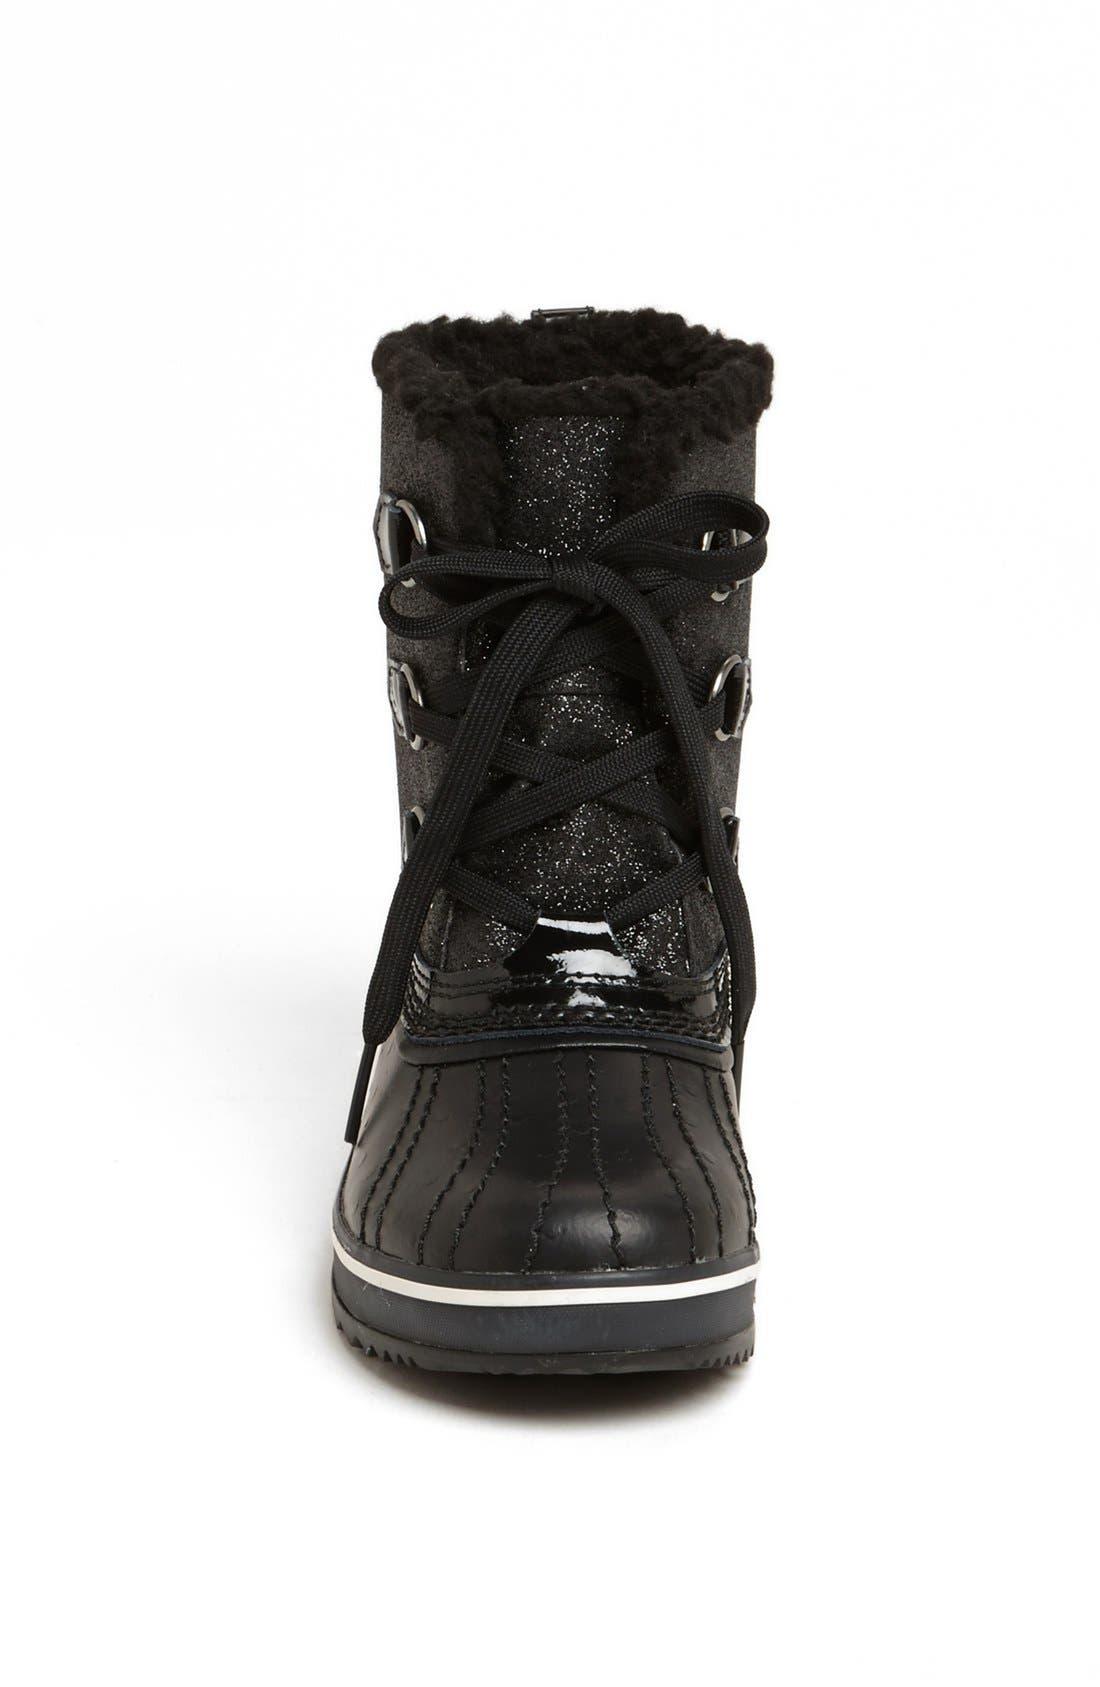 Alternate Image 3  - SOREL 'Youth Tivoli - Glitter' Boot (Little Kid & Big Kid)